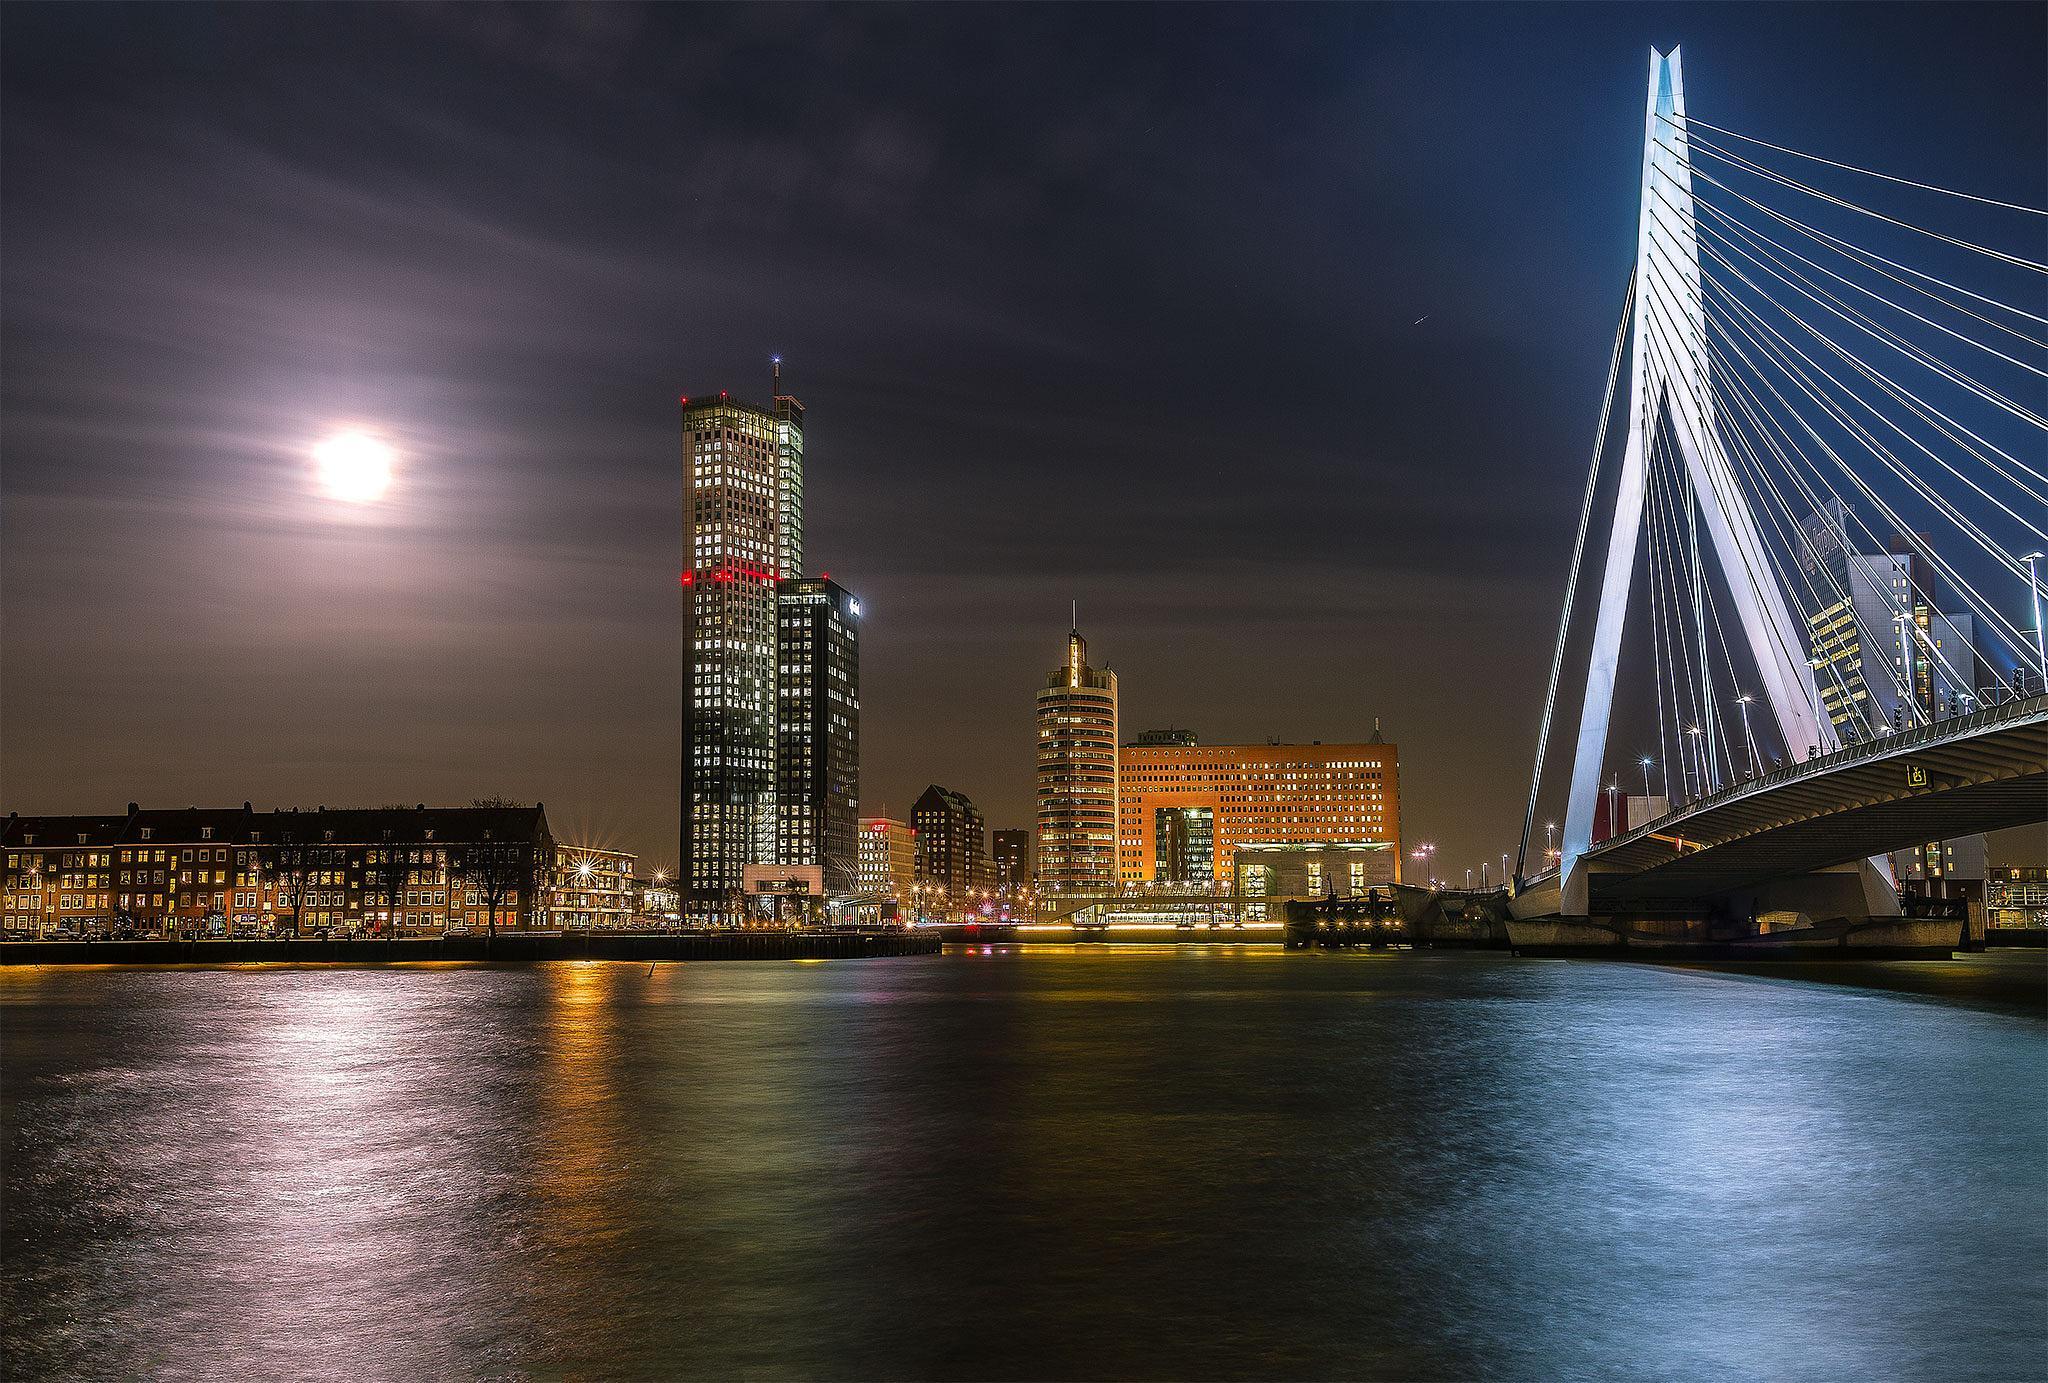 Maas Tower and Erasmusbridge by Rémon Lourier